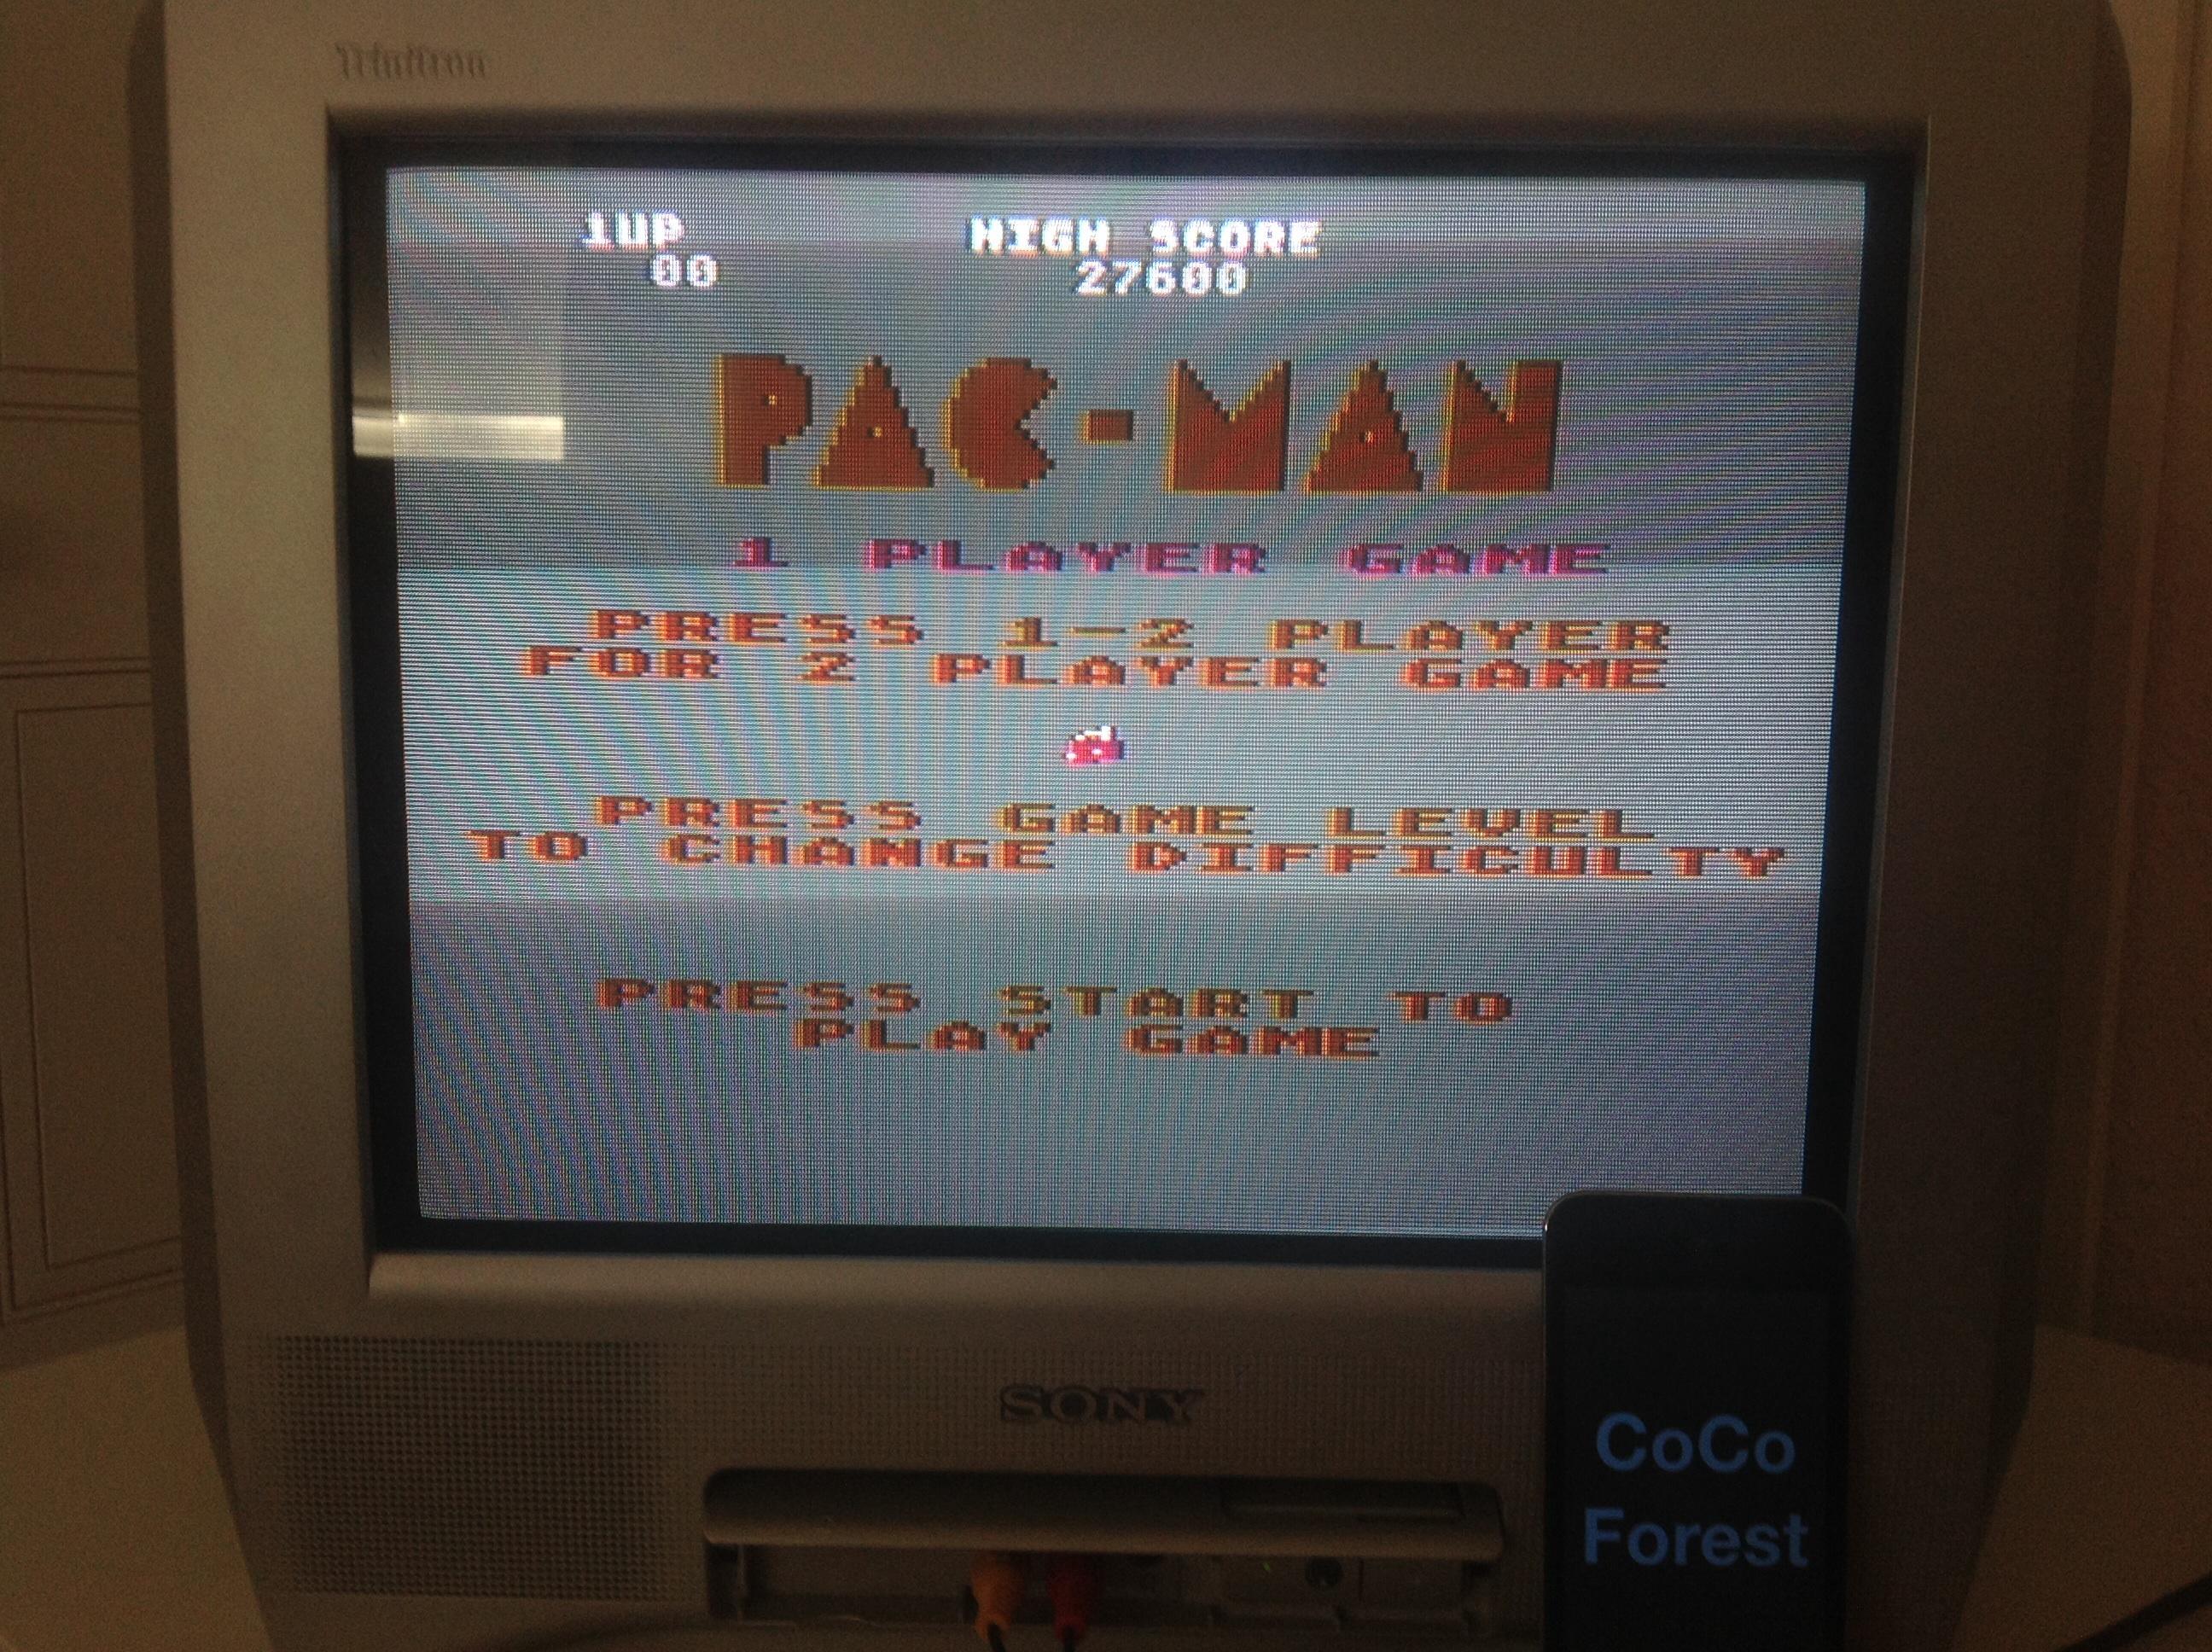 CoCoForest: Pac-Man: Cherries Start (Atari 5200) 27,600 points on 2014-05-17 11:05:00